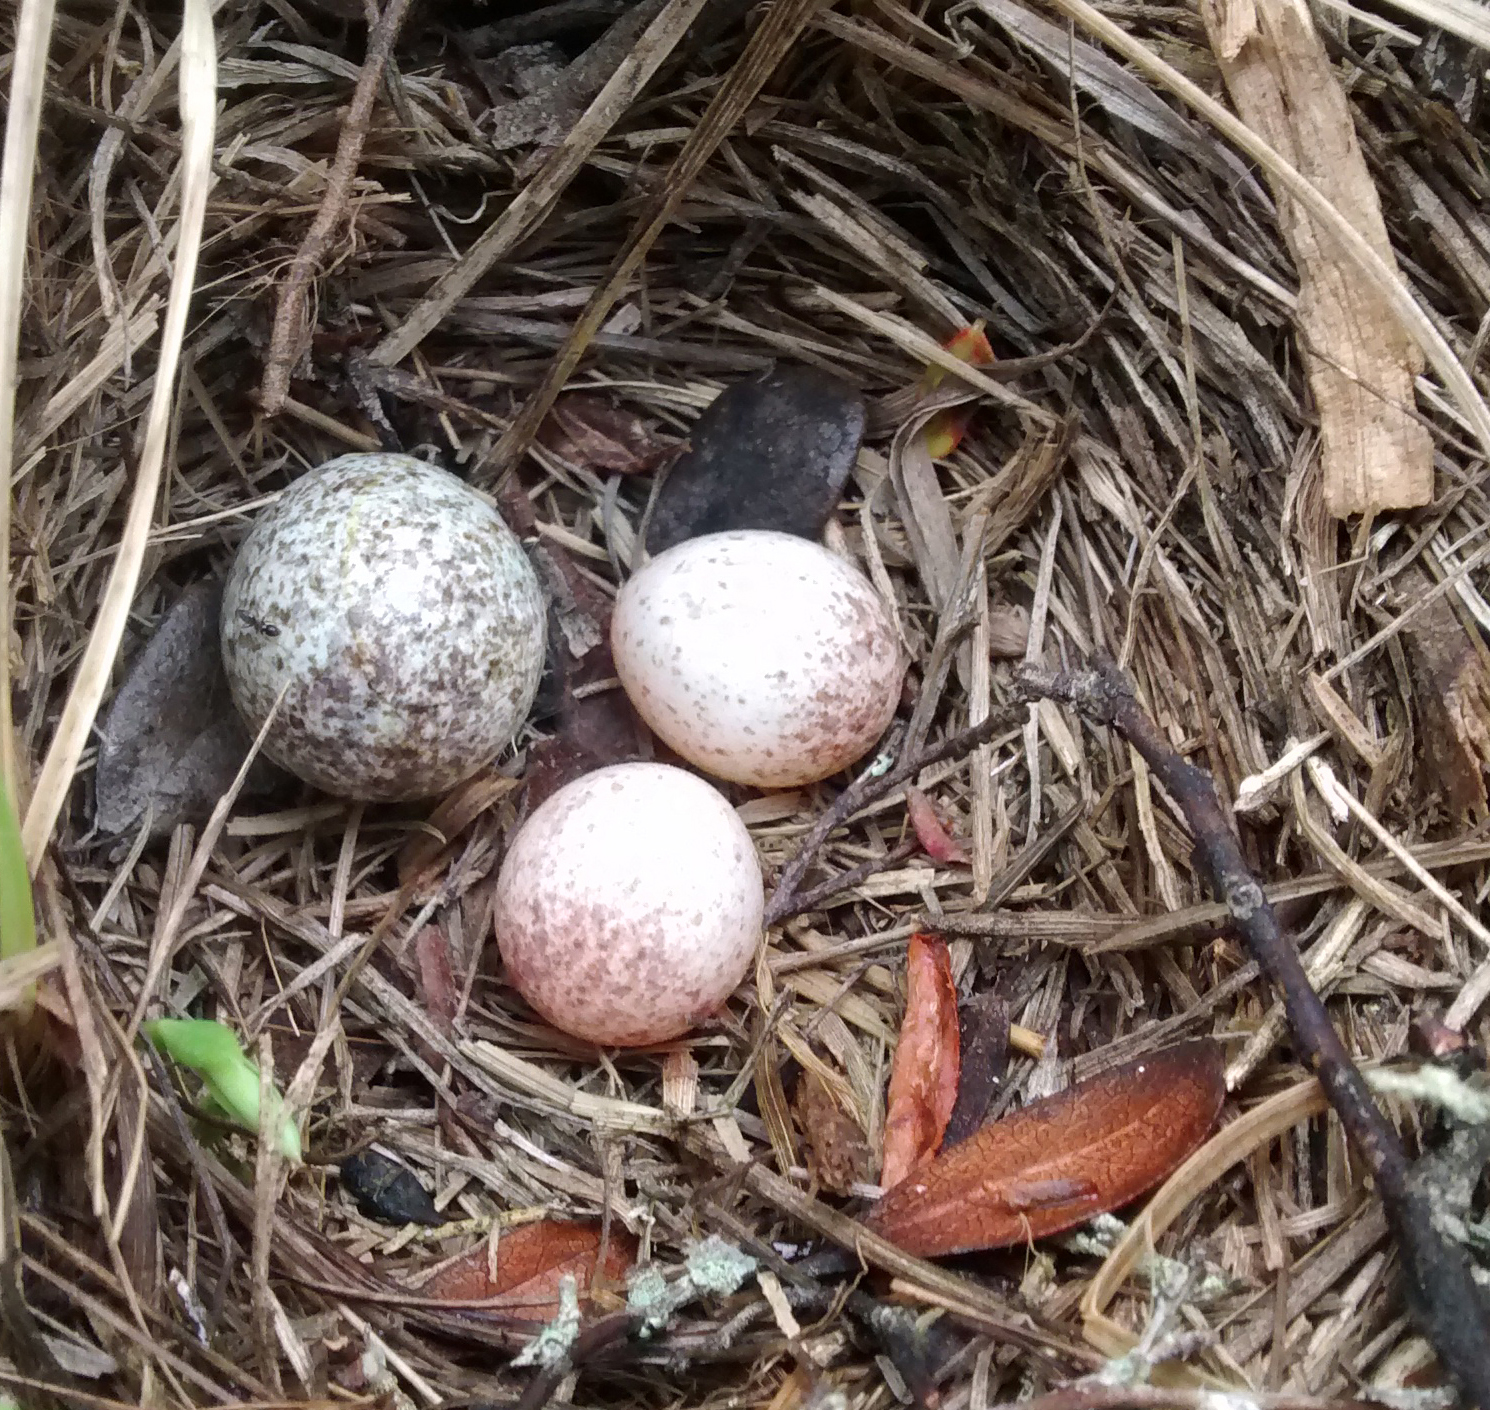 Parasitized nest no border.jpg